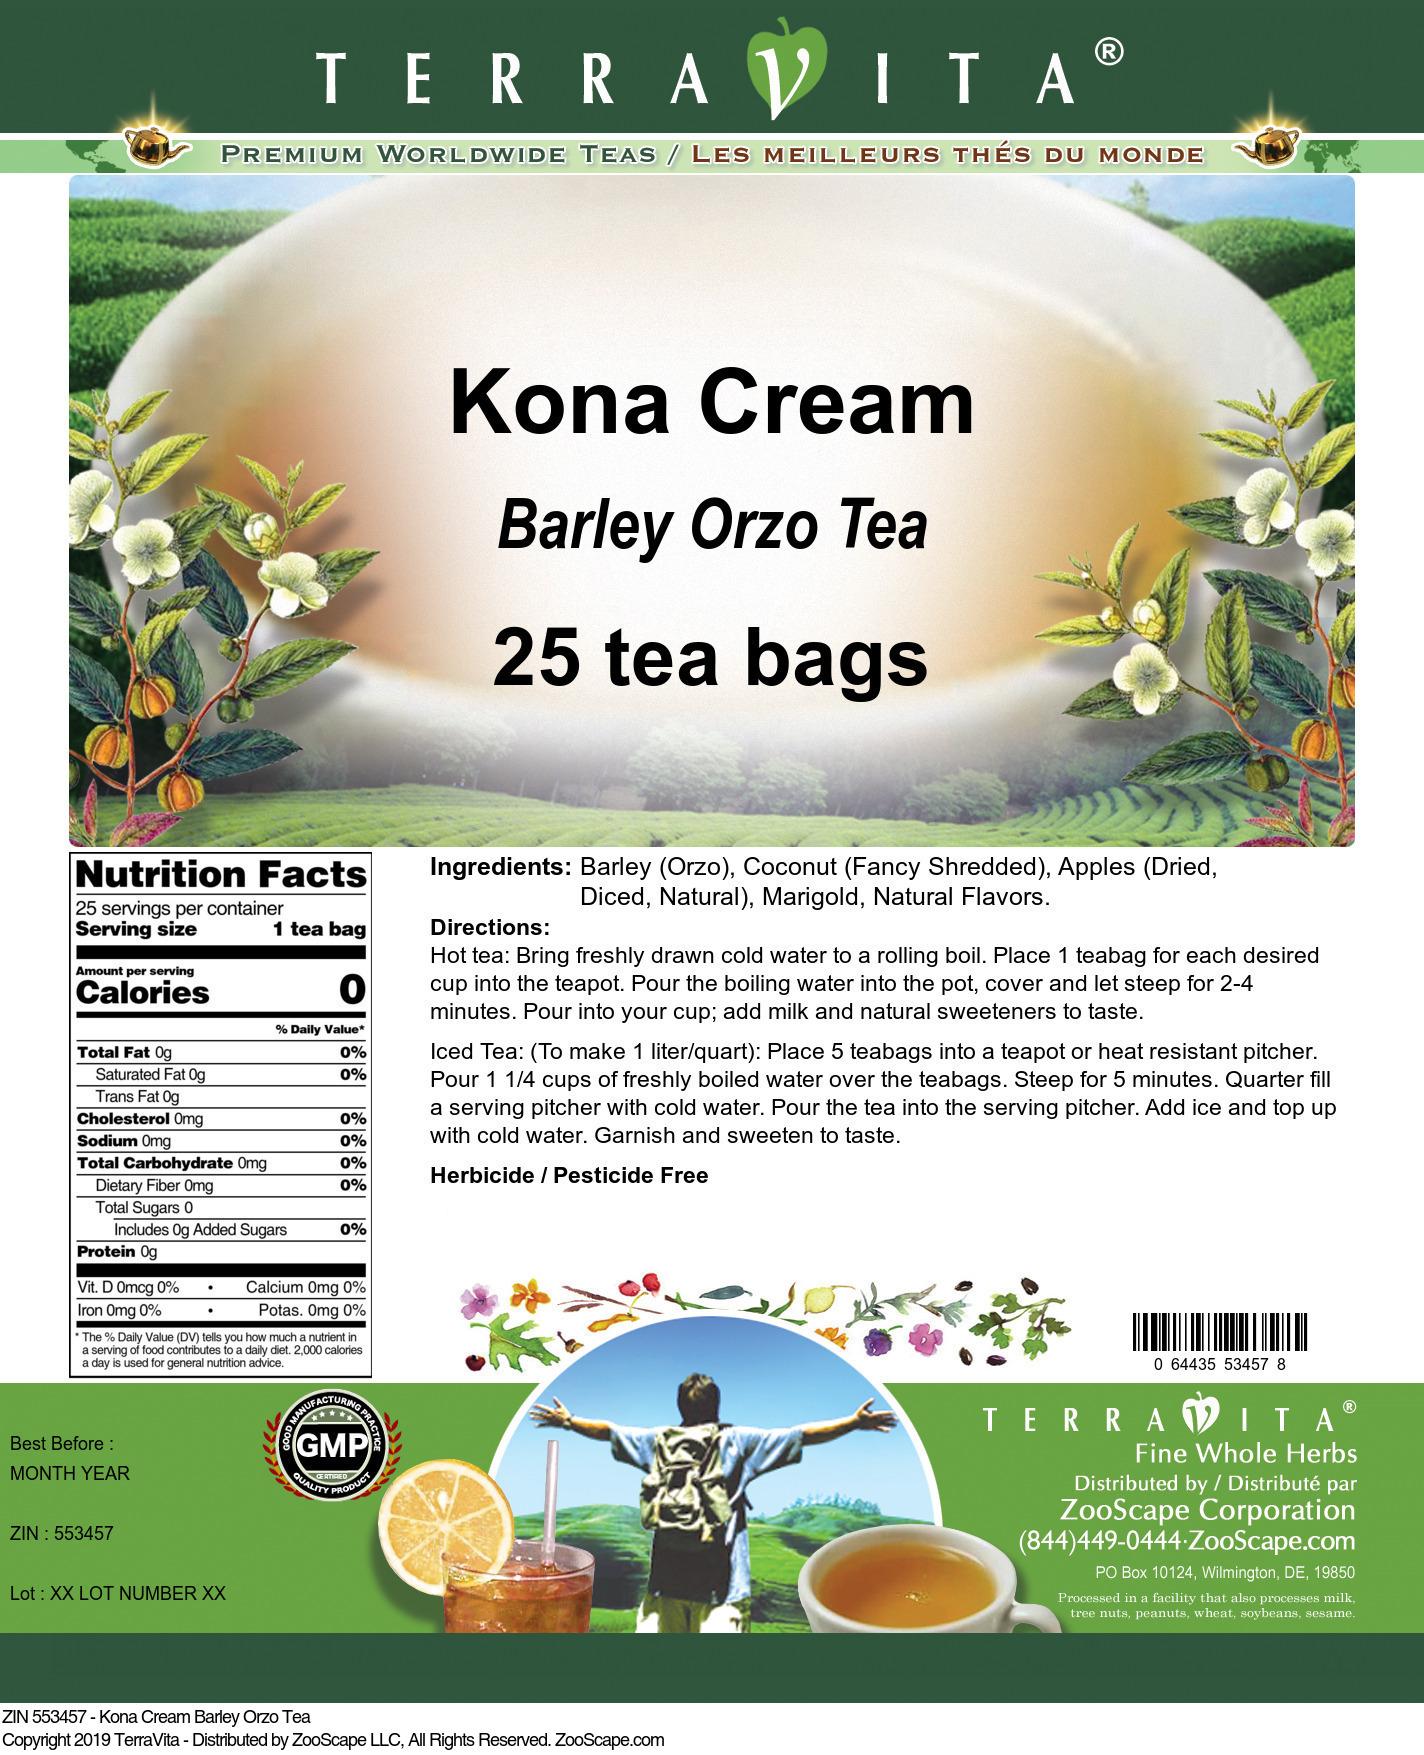 Kona Cream Barley Orzo Tea